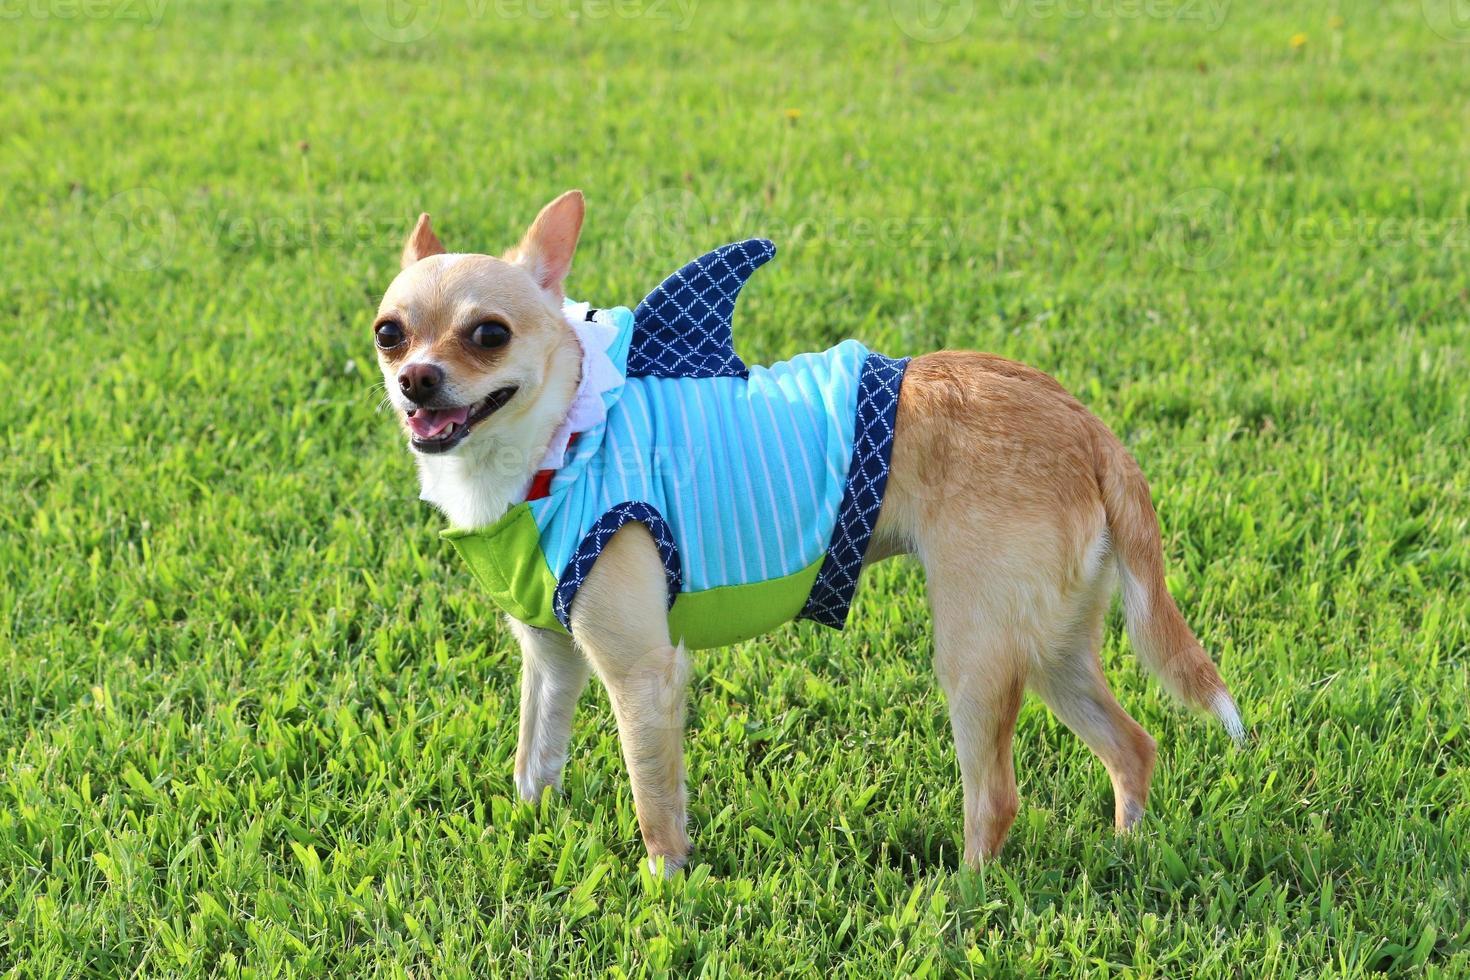 semaine du requin chihuahua! photo